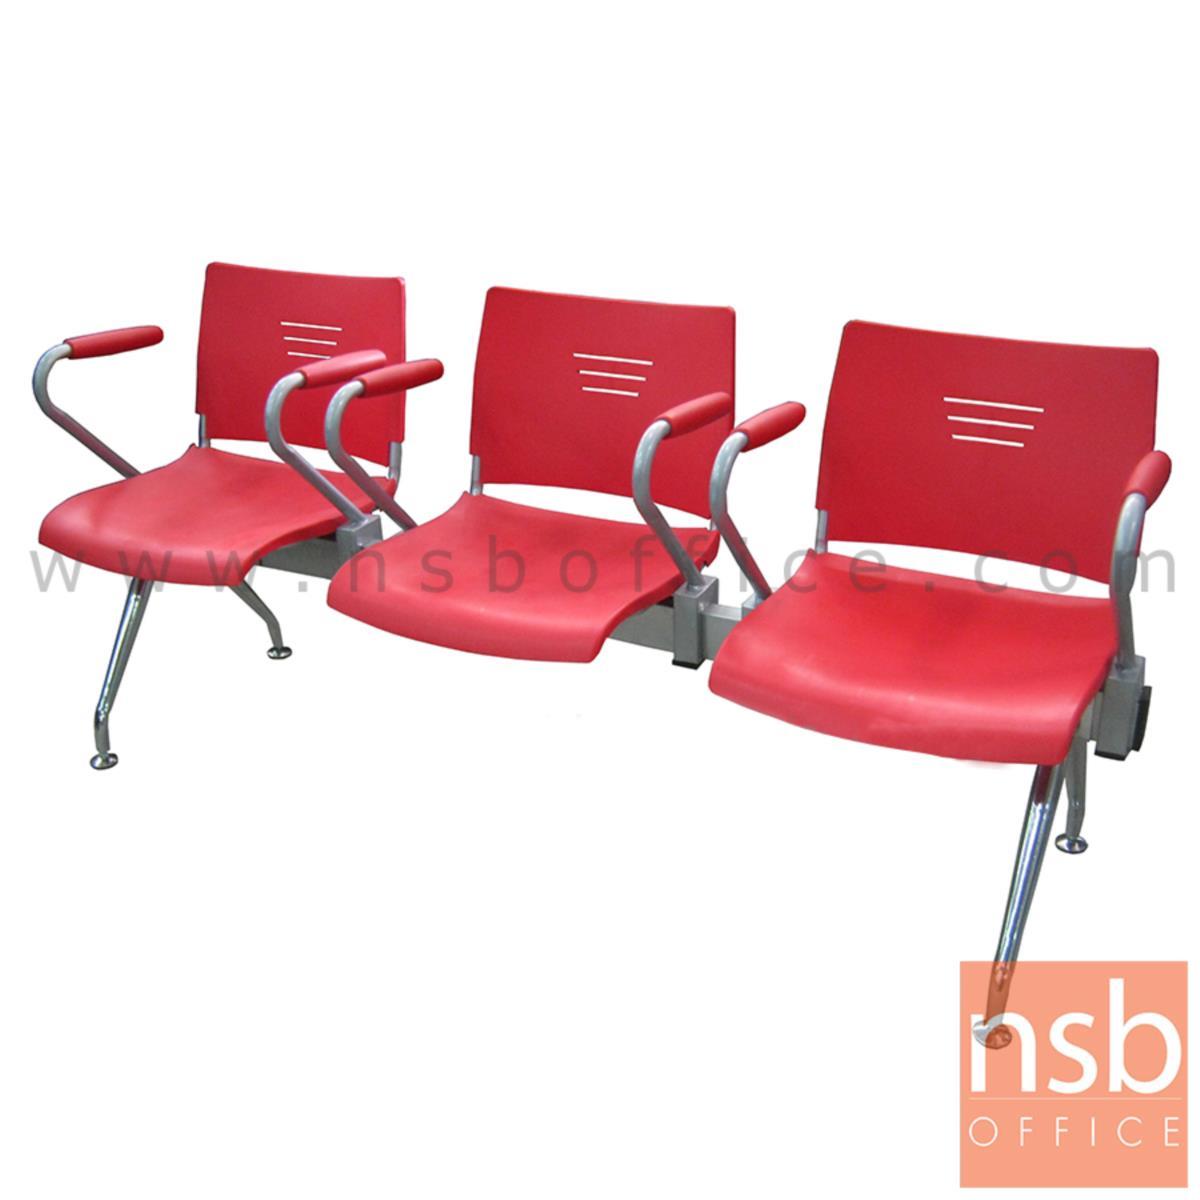 B06A111:เก้าอี้นั่งคอยเฟรมโพลี่ รุ่น Clarion (แคร์เรียน) 2 ,3 ,4 ที่นั่ง ขนาด 112W ,171W ,228W cm. ขาเหล็ก